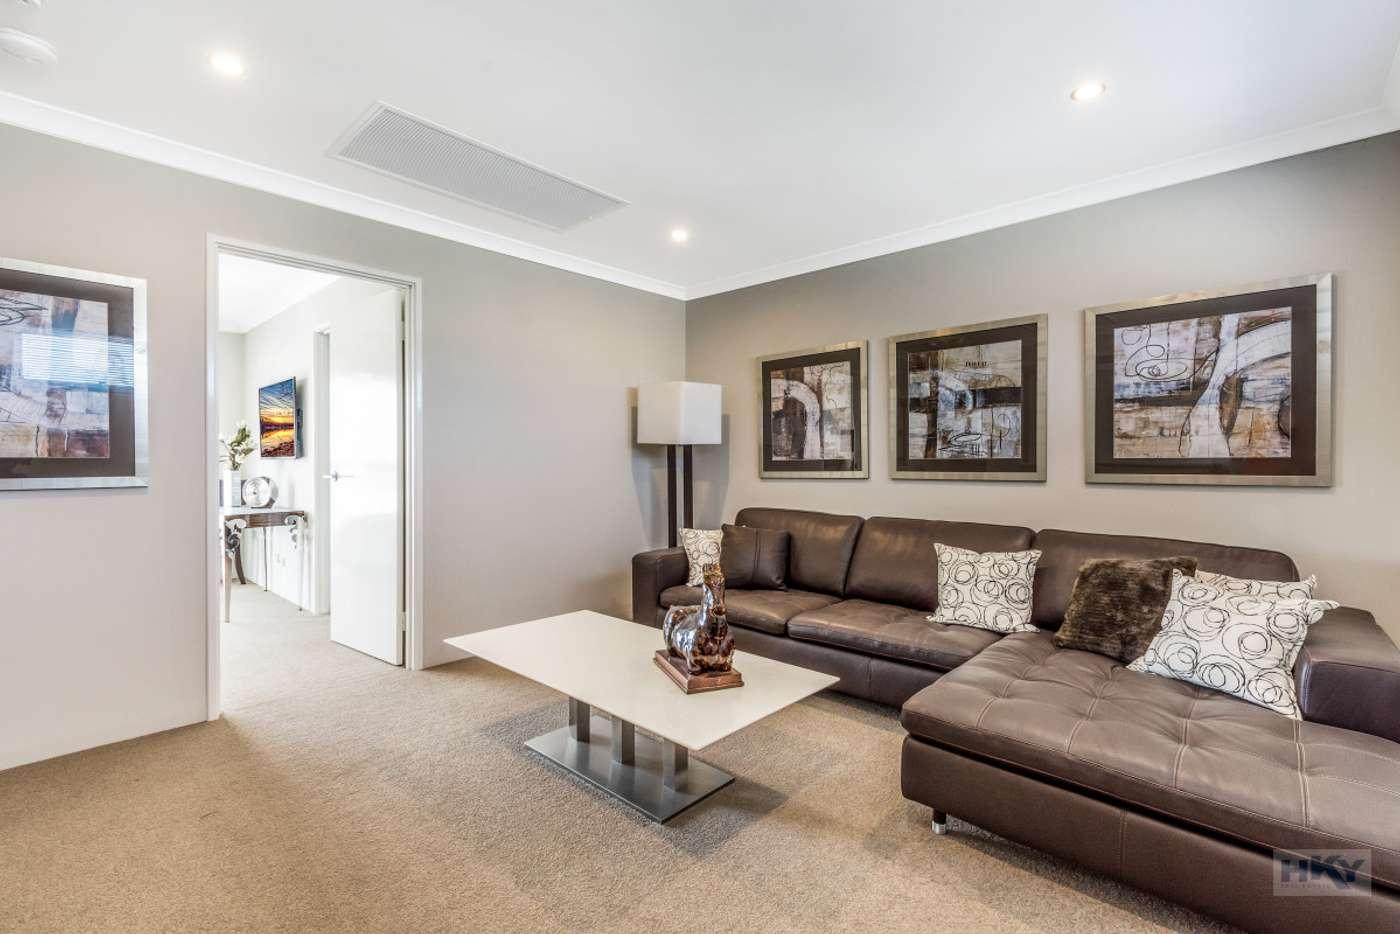 Sixth view of Homely house listing, 16 Zodiac Drive, Alkimos WA 6038